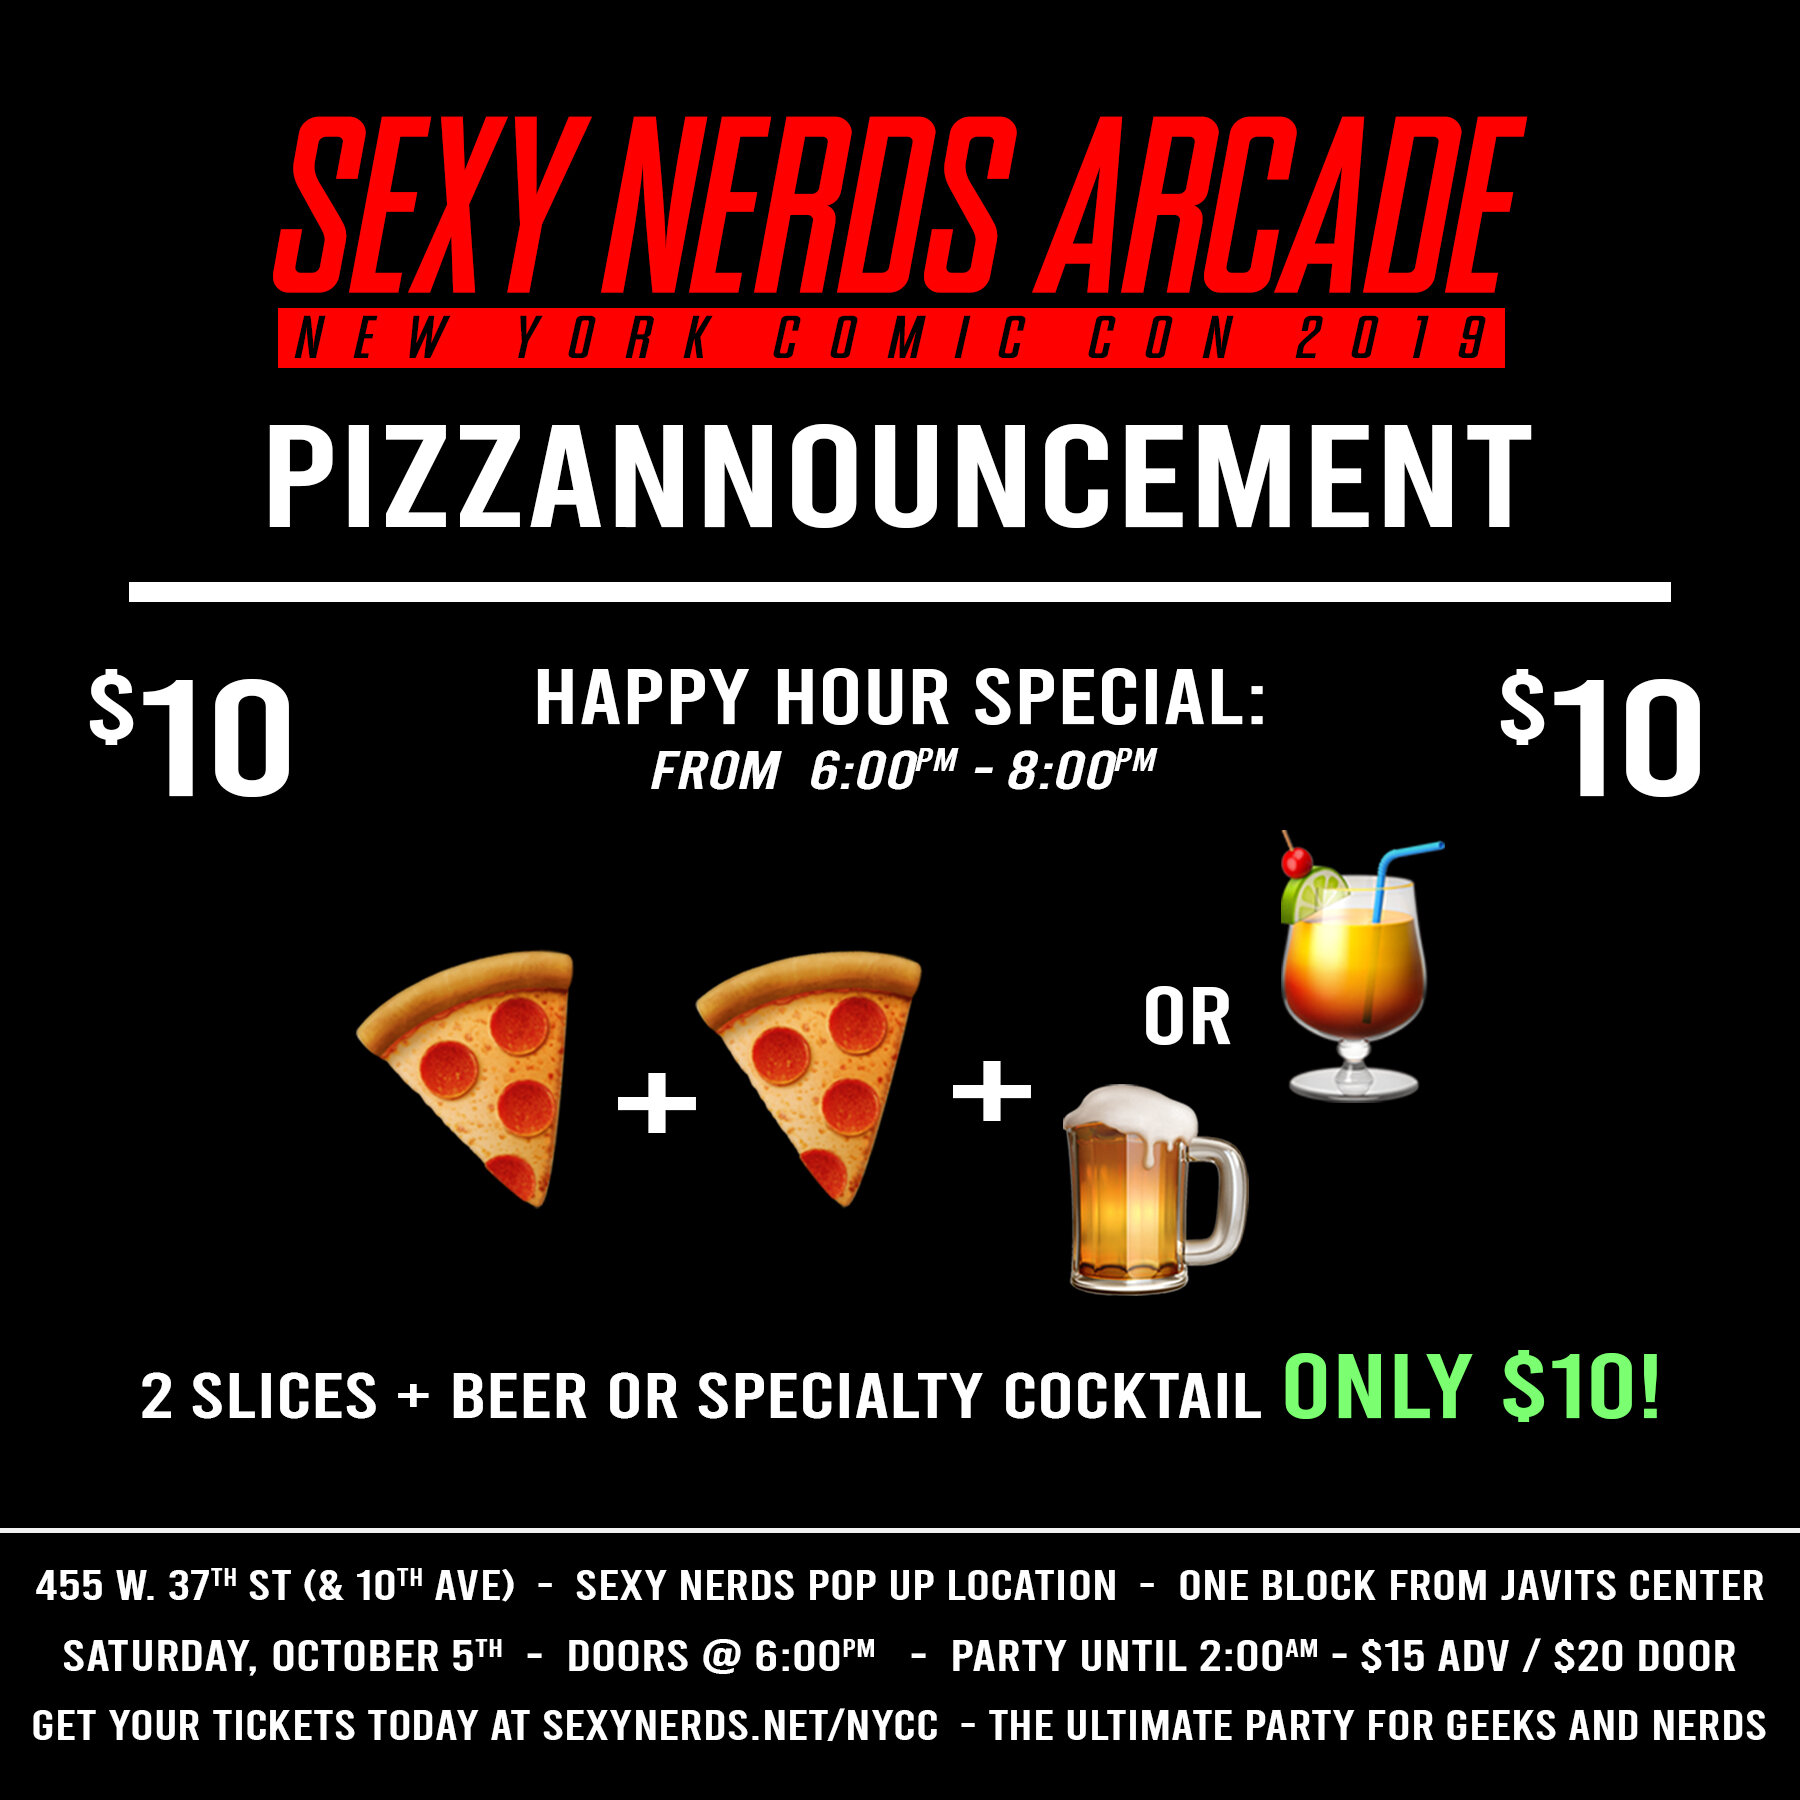 SNA pizzannouncement 1.jpg